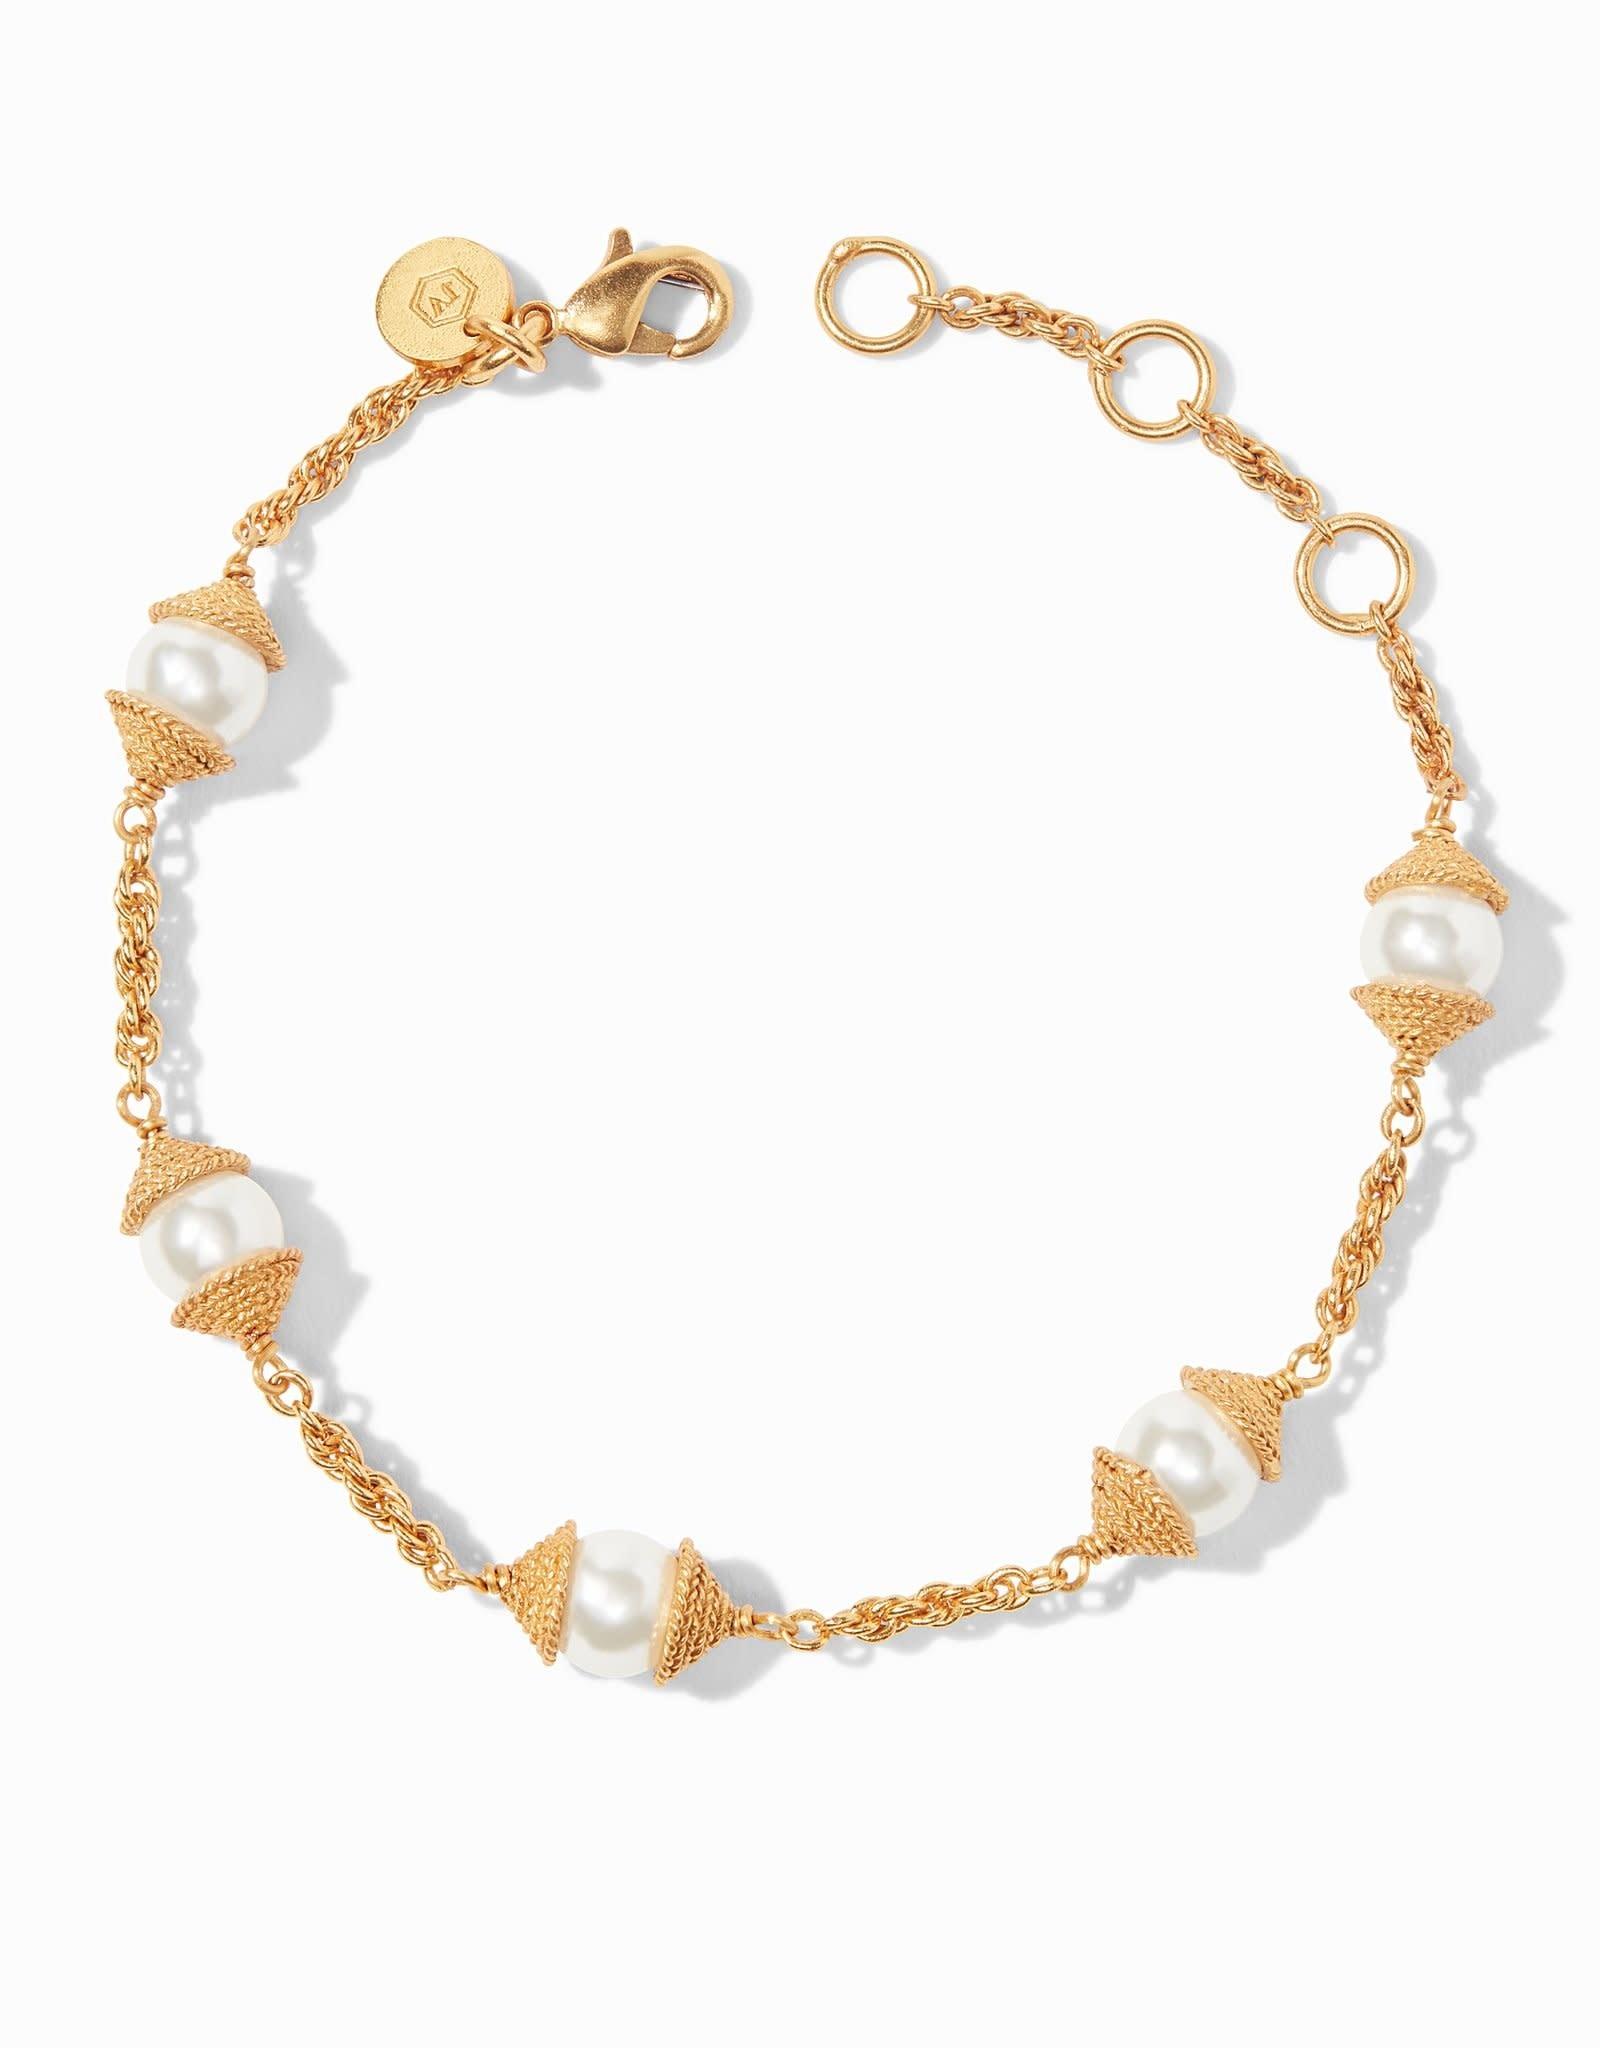 Julie Vos Calypso Pearl Delicate Bracelet Gold